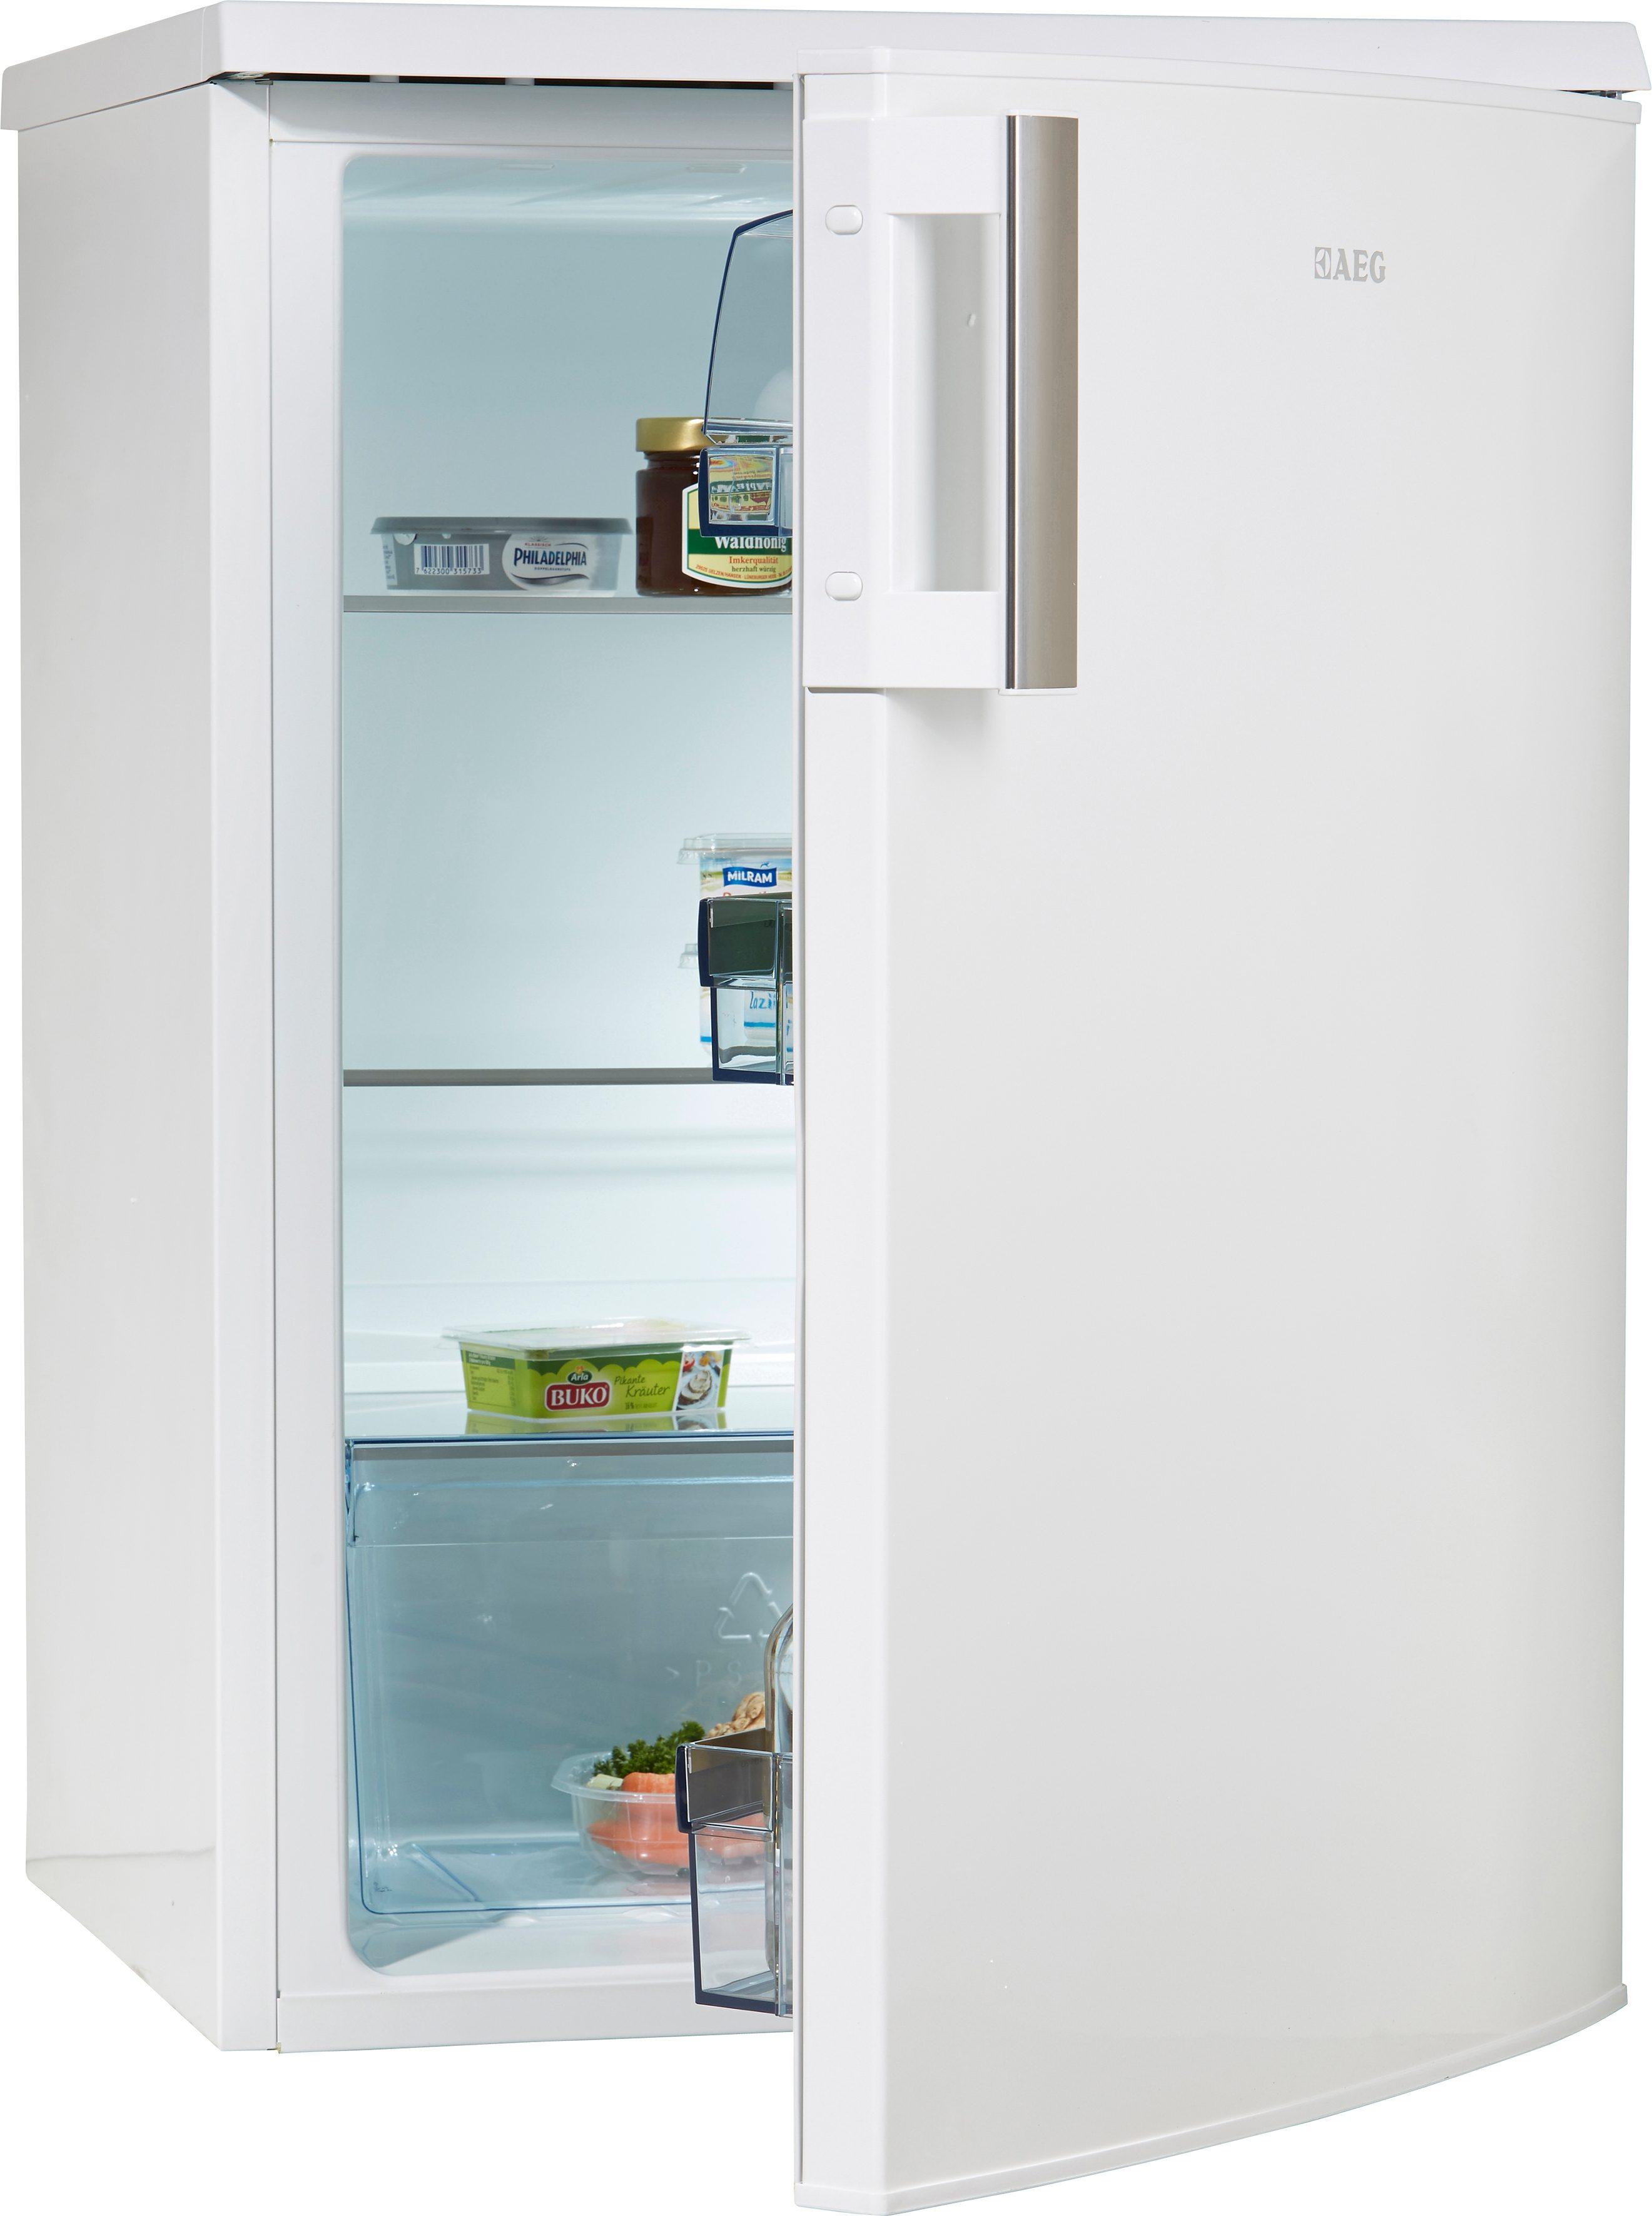 AEG Kühlschrank S81700TSW0 / SANTO, A++, 85,0 cm hoch